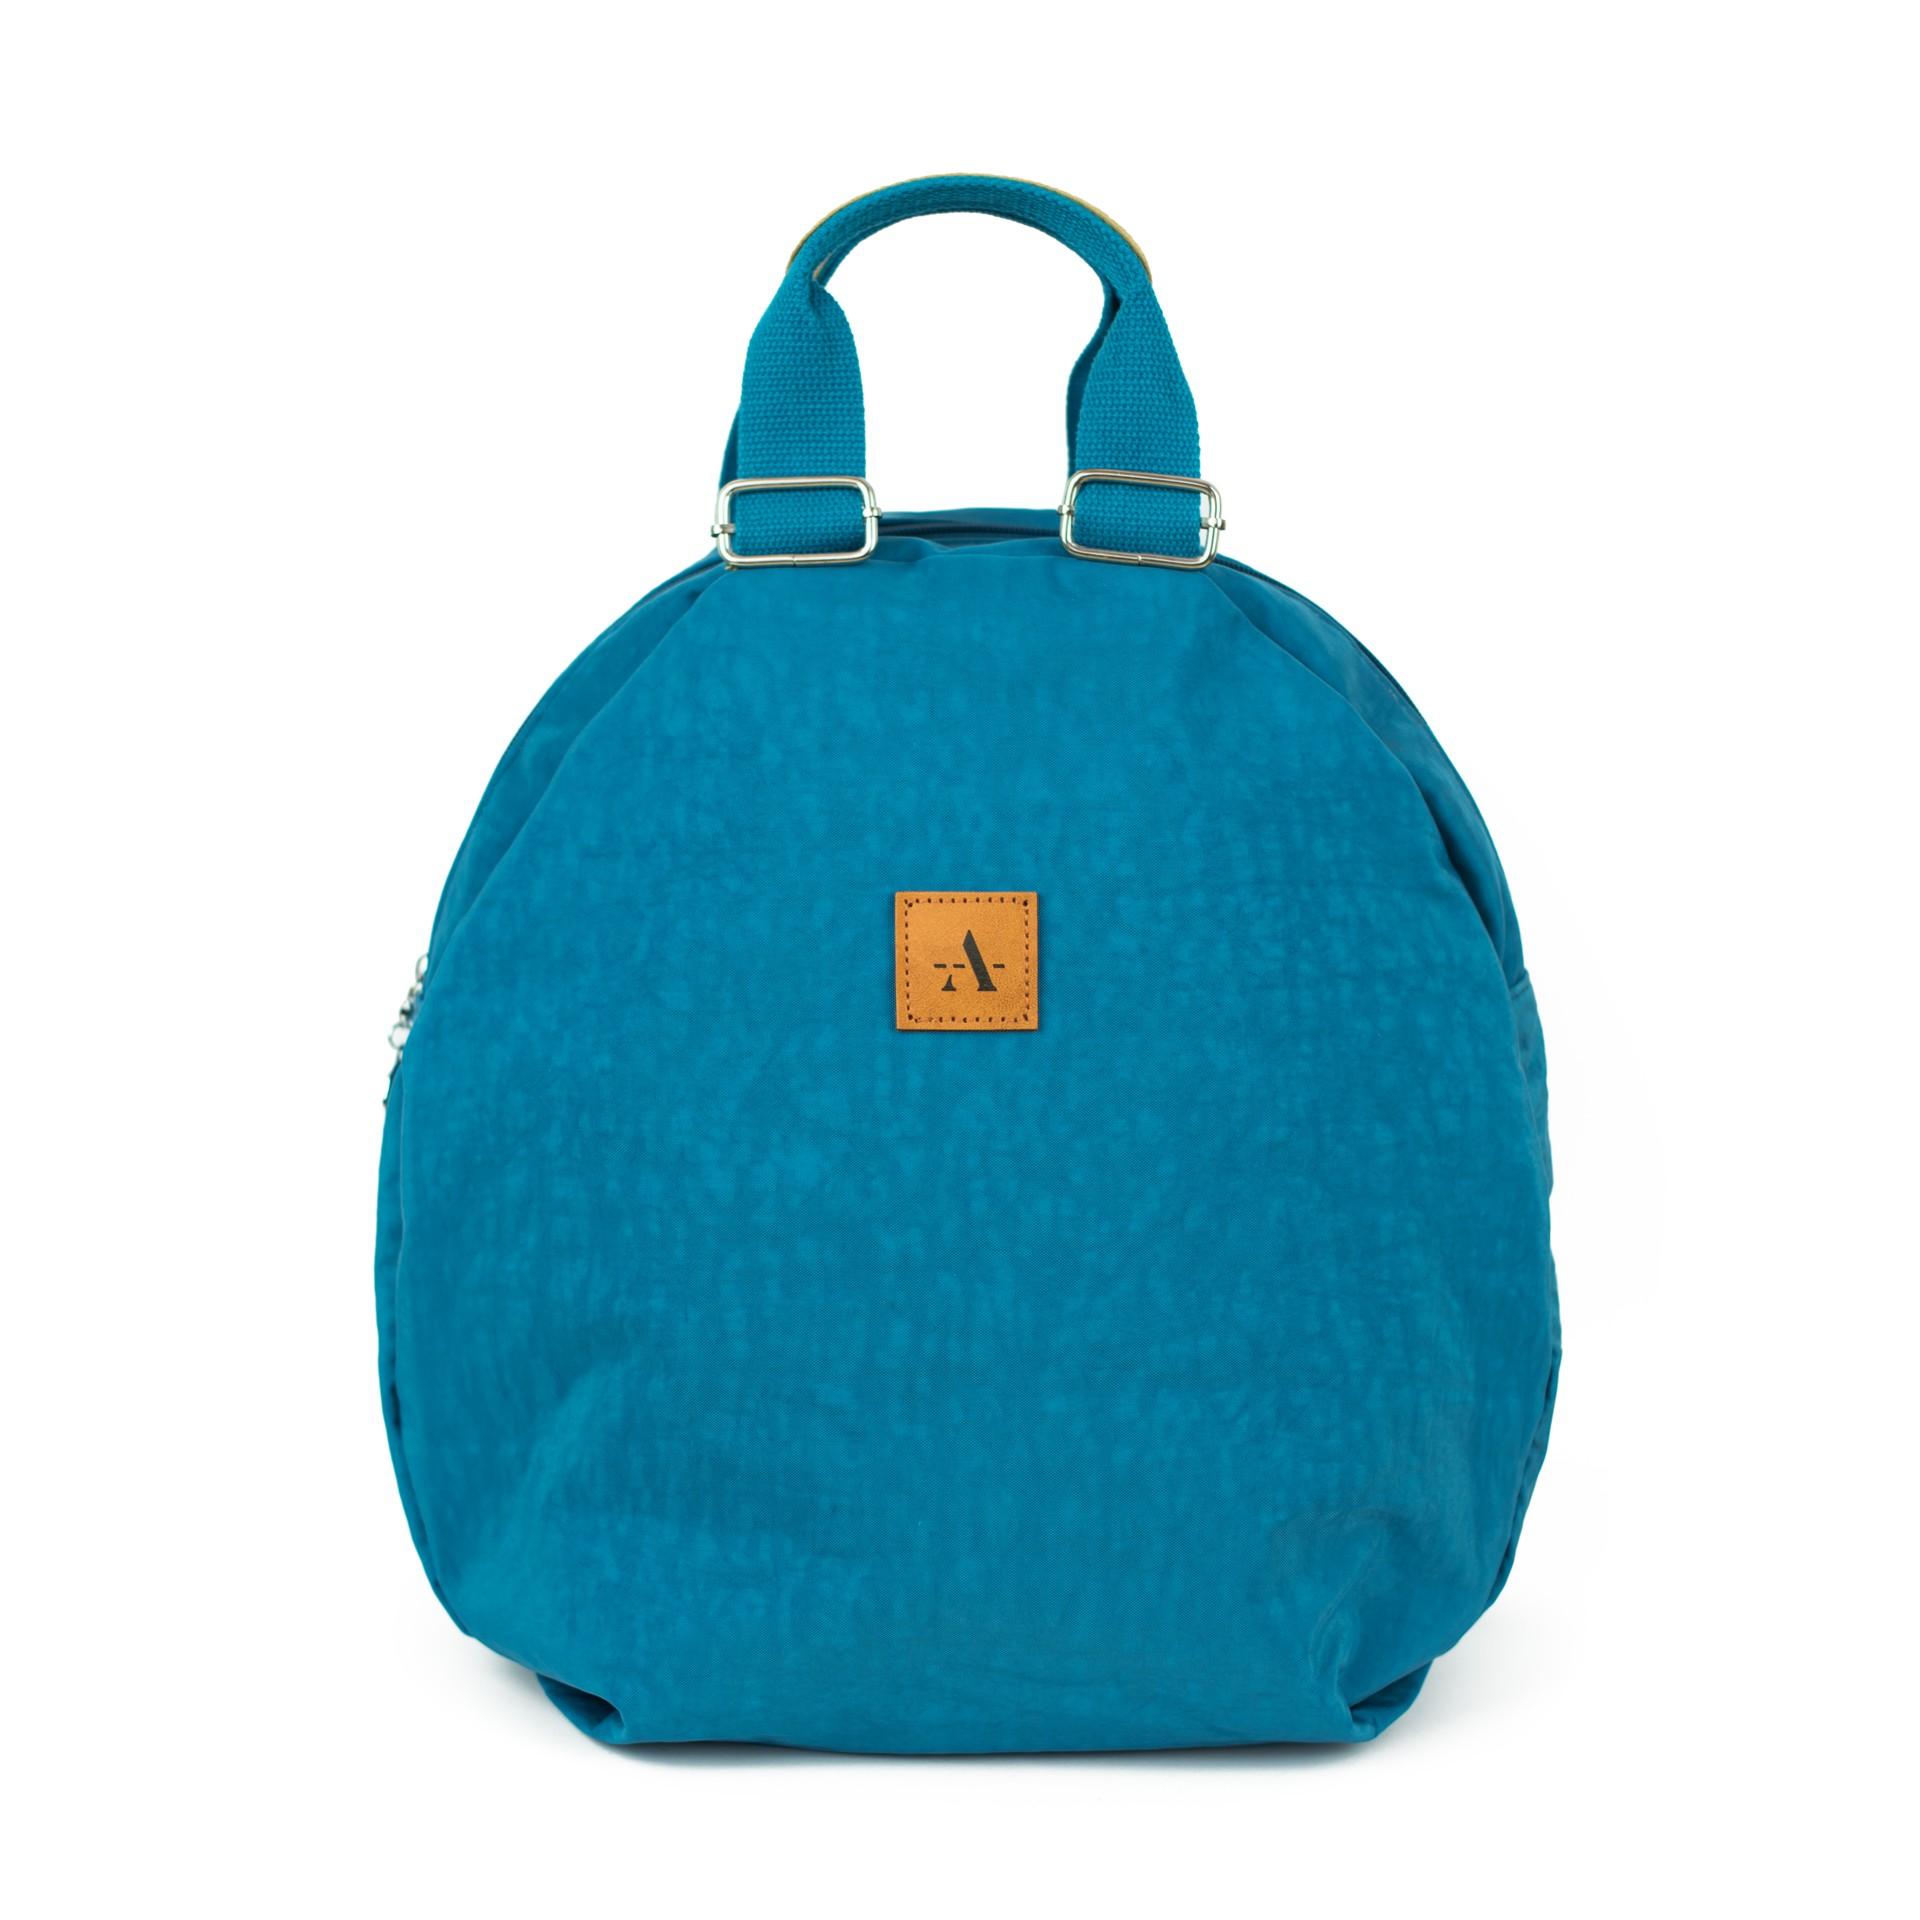 Art Of Polo Unisex's Backpack tr19539